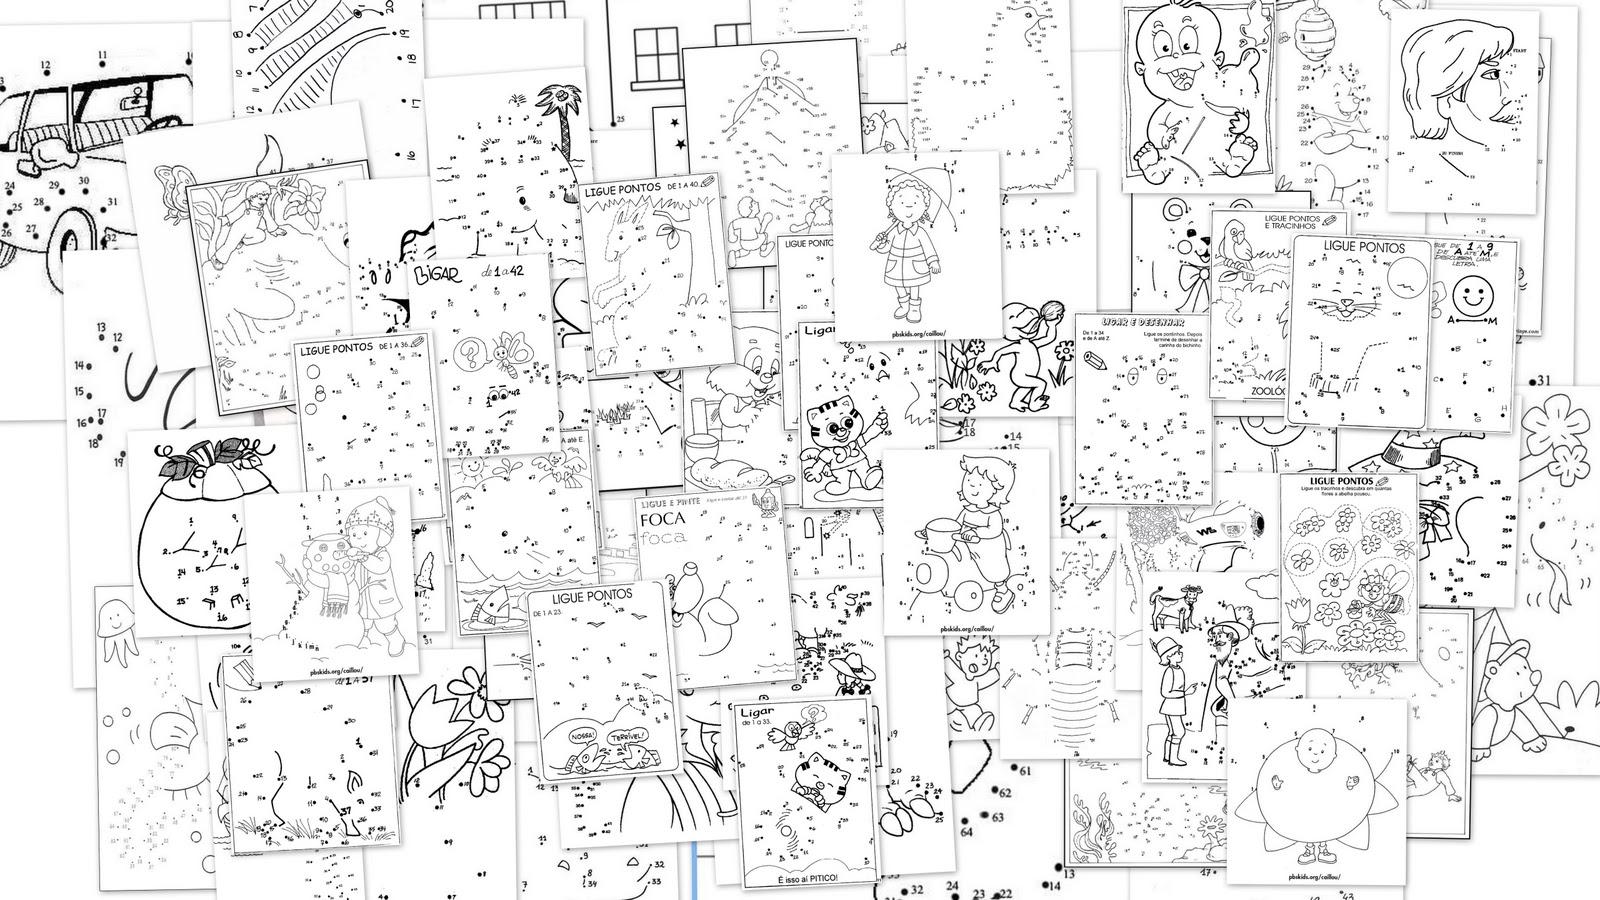 Manualidades para niños: Collage dibujos infantiles